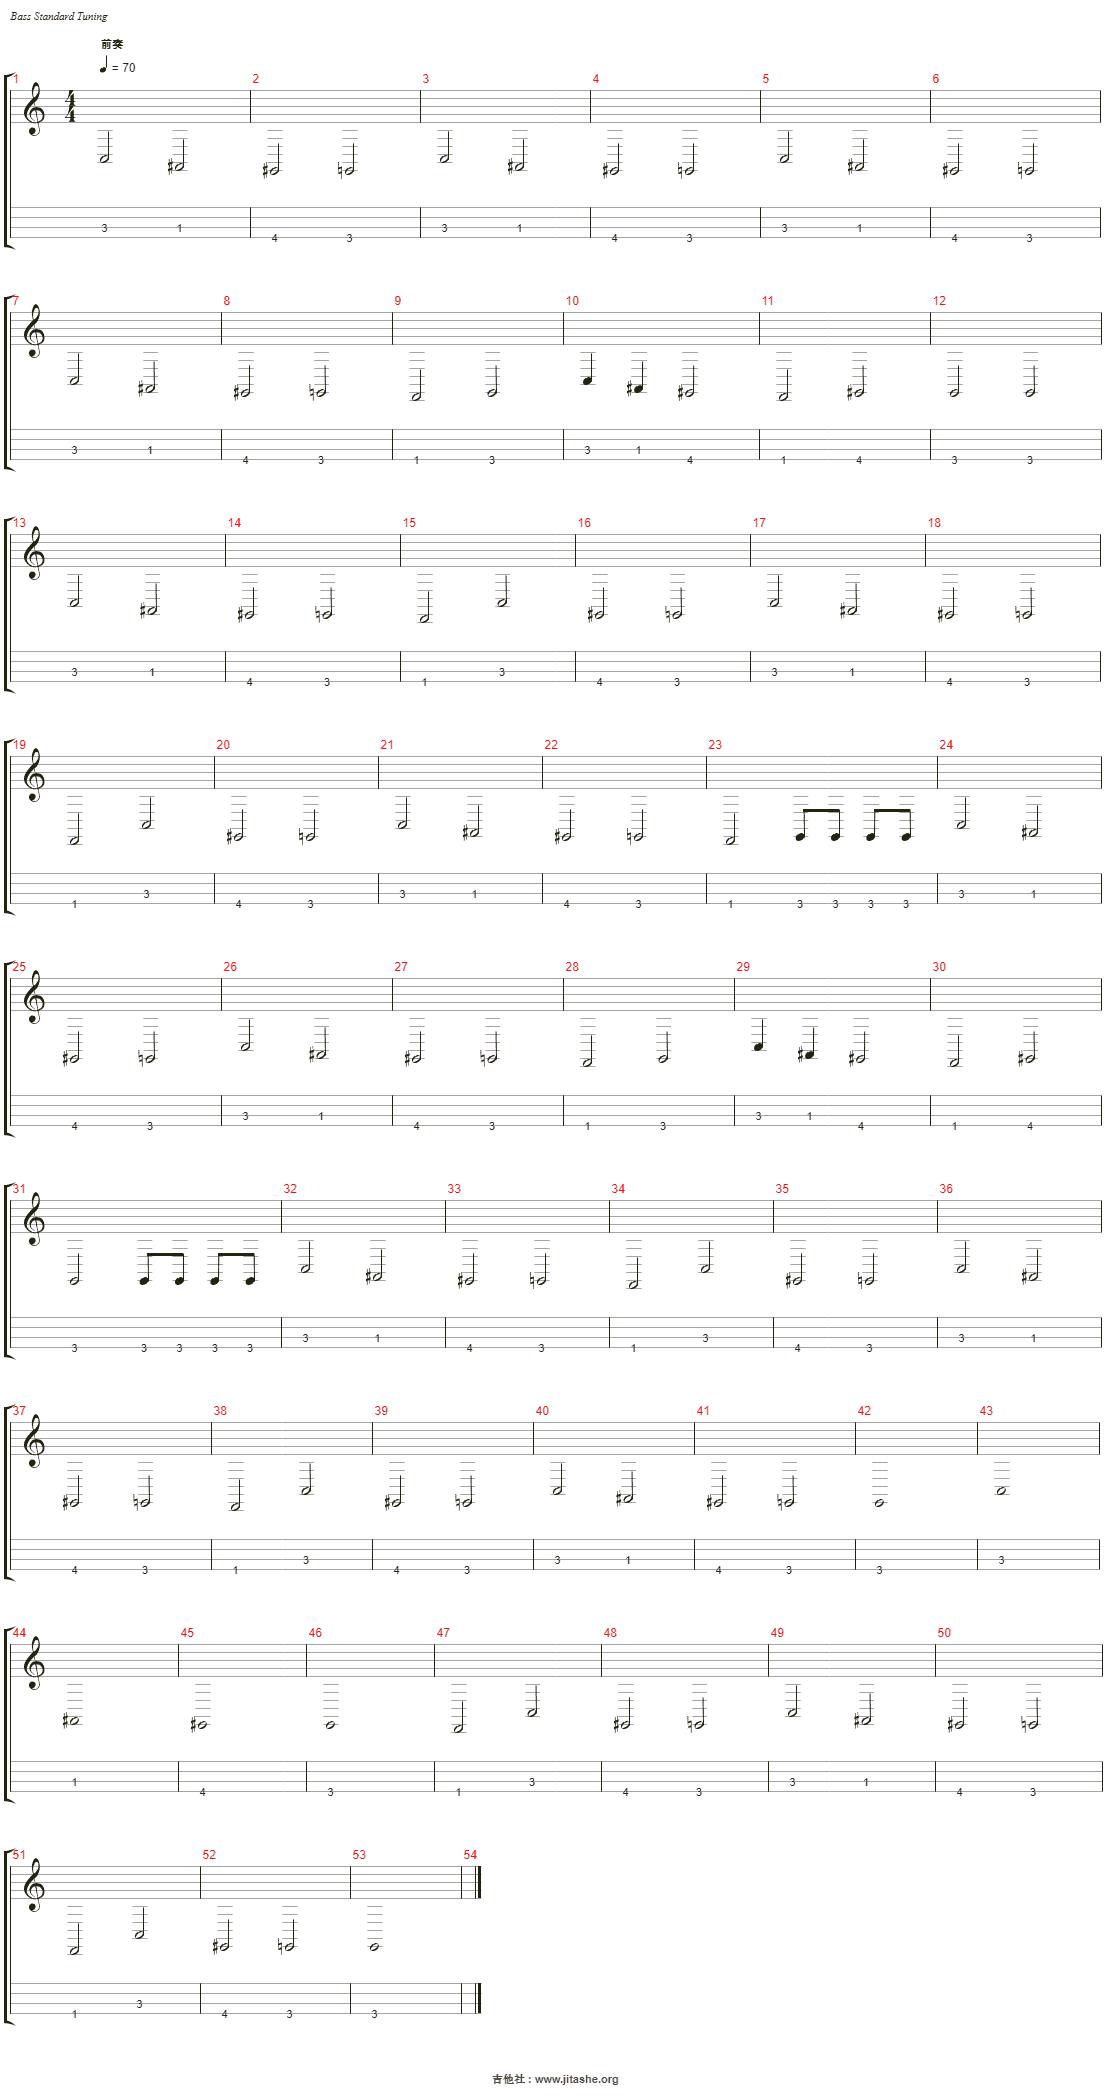 红玫瑰吉他谱(Acoustic Bass)_陈奕迅